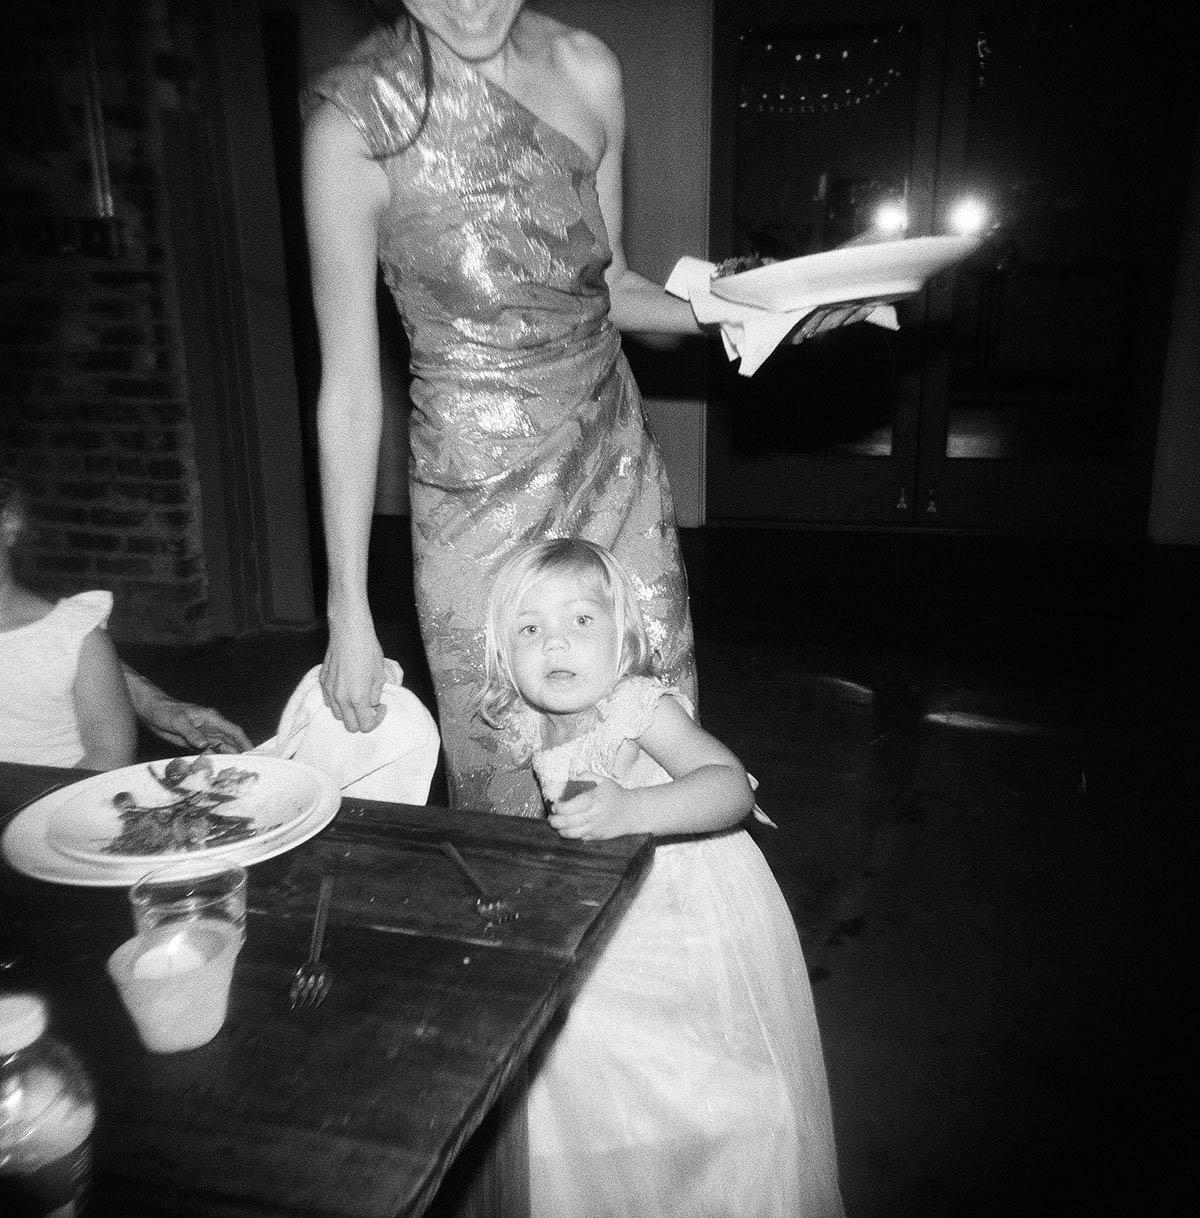 37-little-wedding-guest-holga.jpg